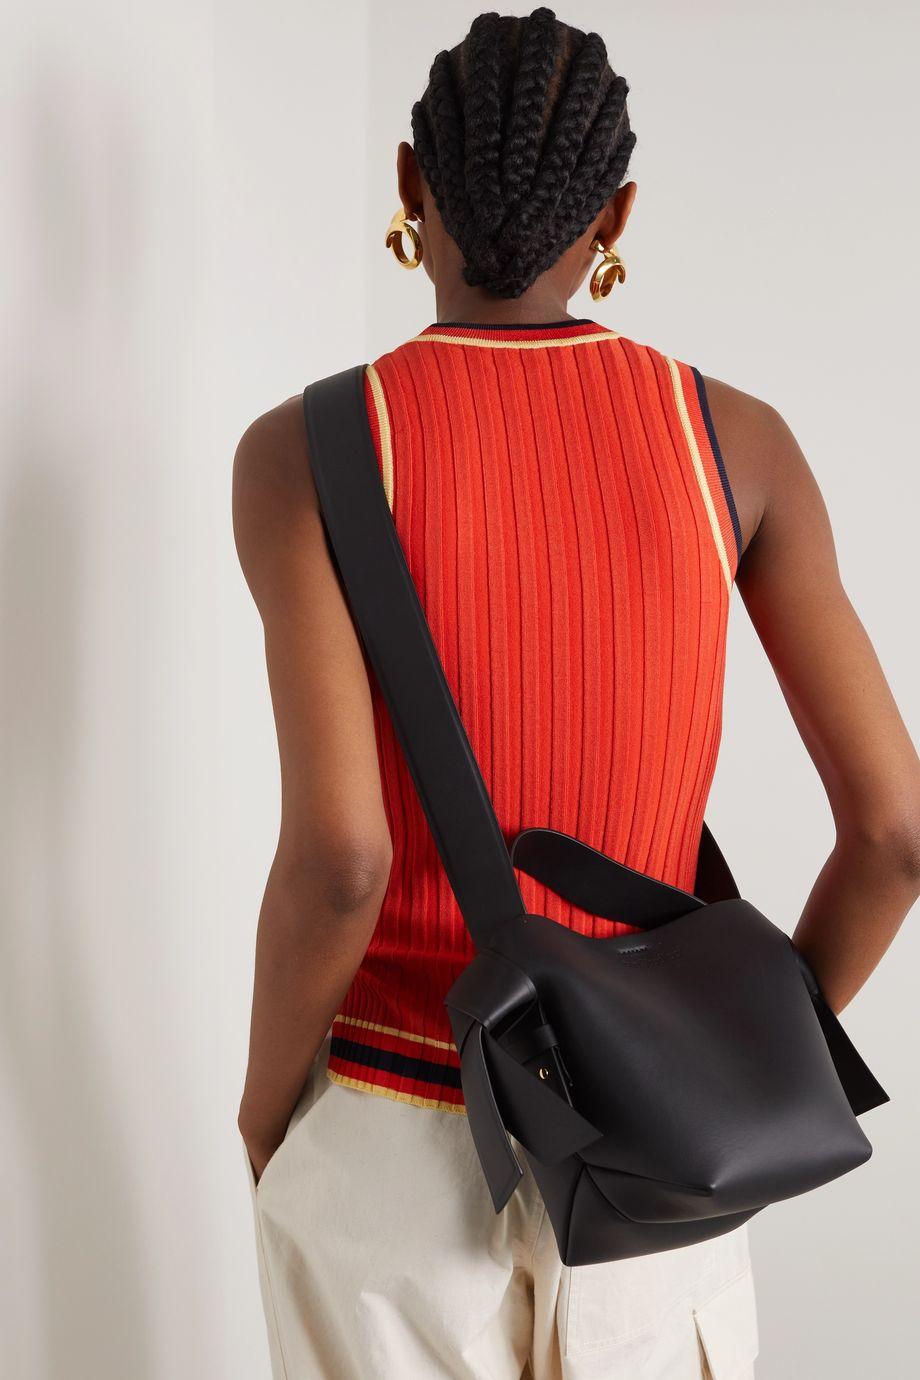 Acne Studios Musubi Mini Schultertasche aus Leder mit Knotendetails